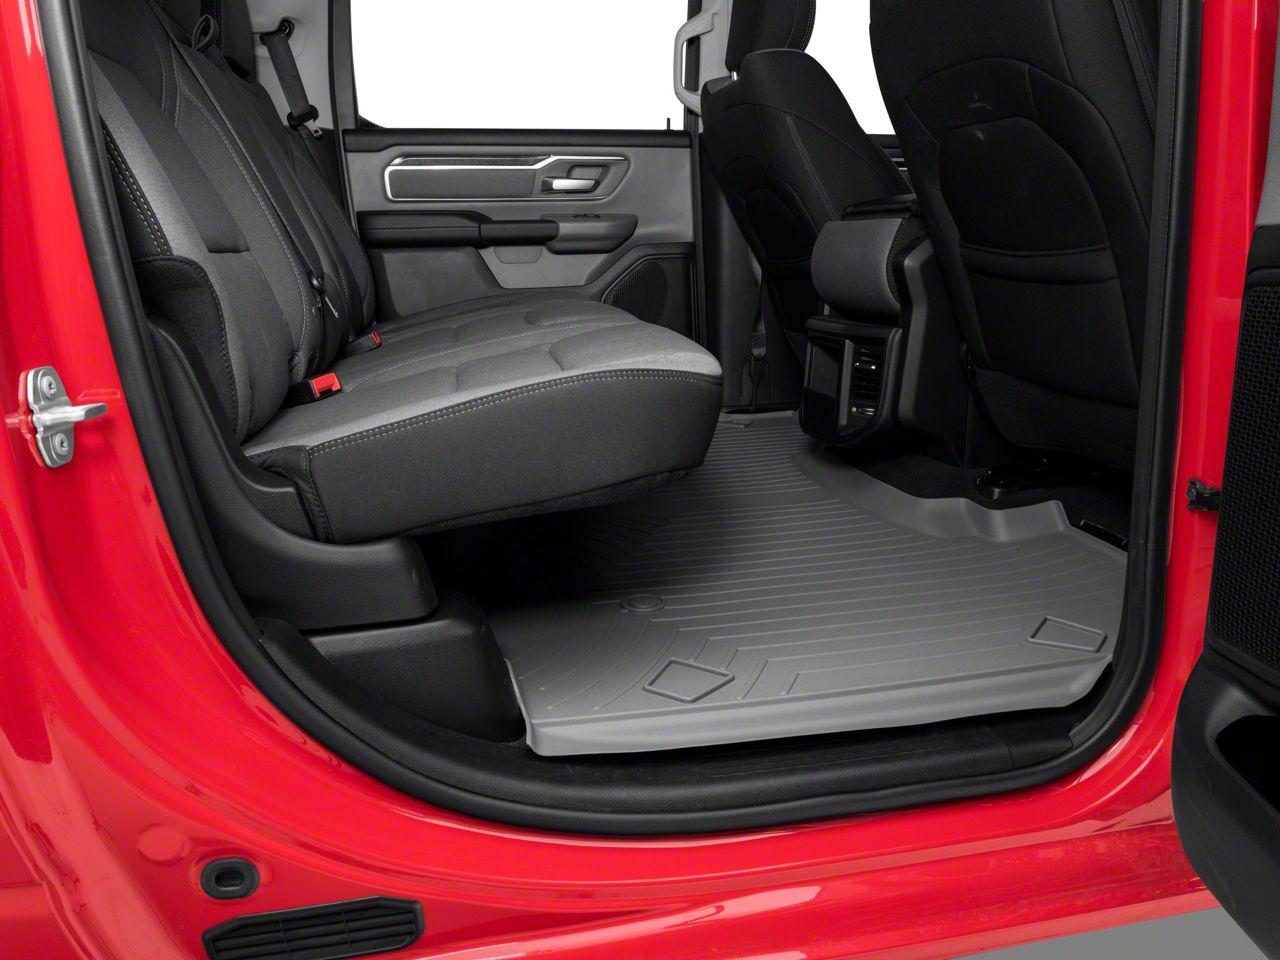 Weathertech DigitalFit Rear Floor Liner - Gray (2019 RAM 1500 Crew Cab)